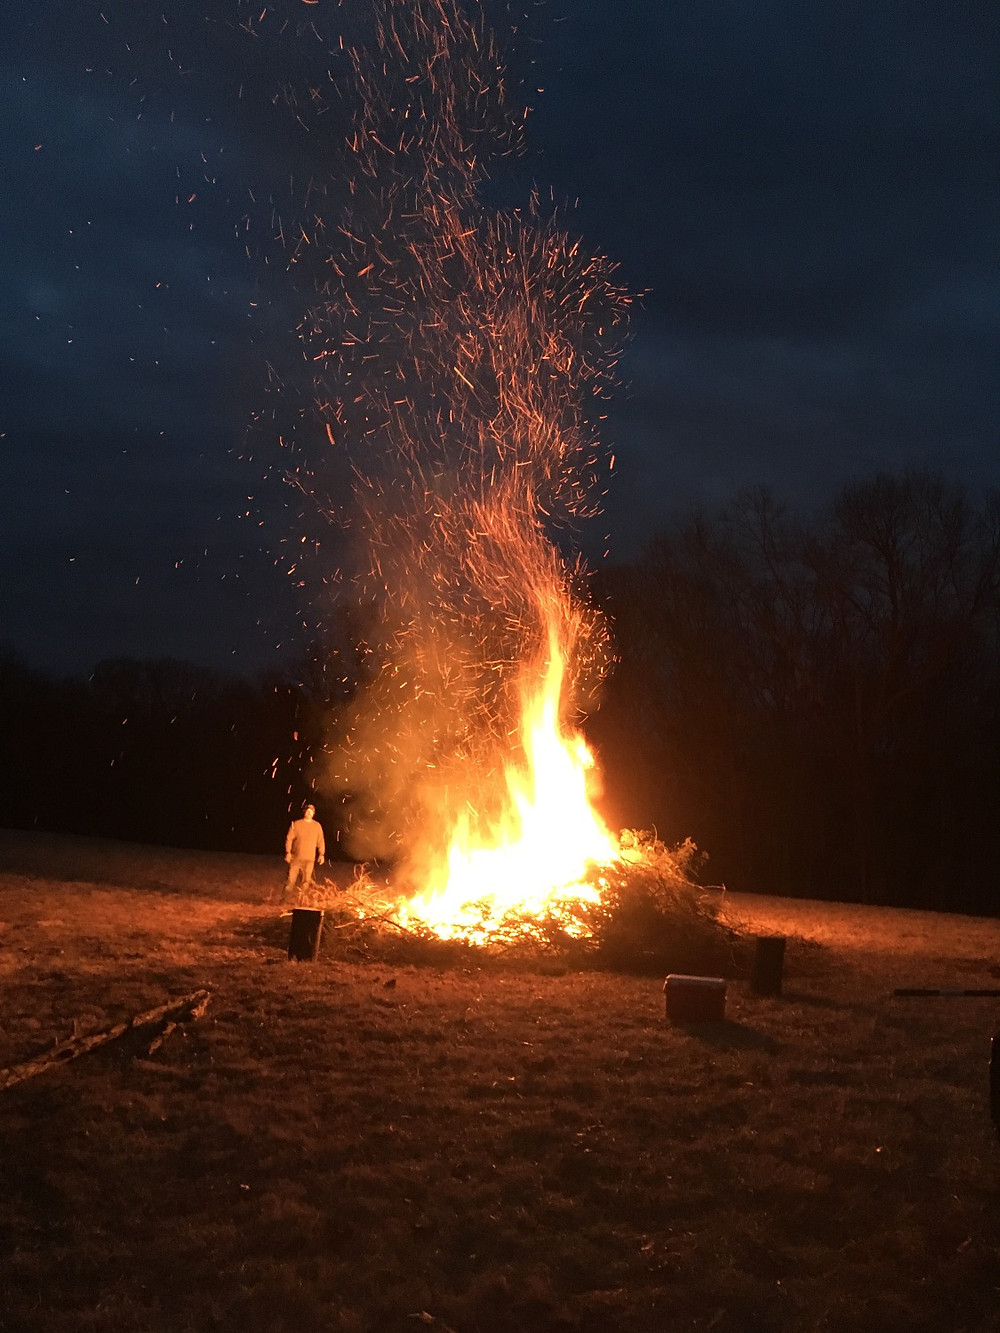 Steve's Fire